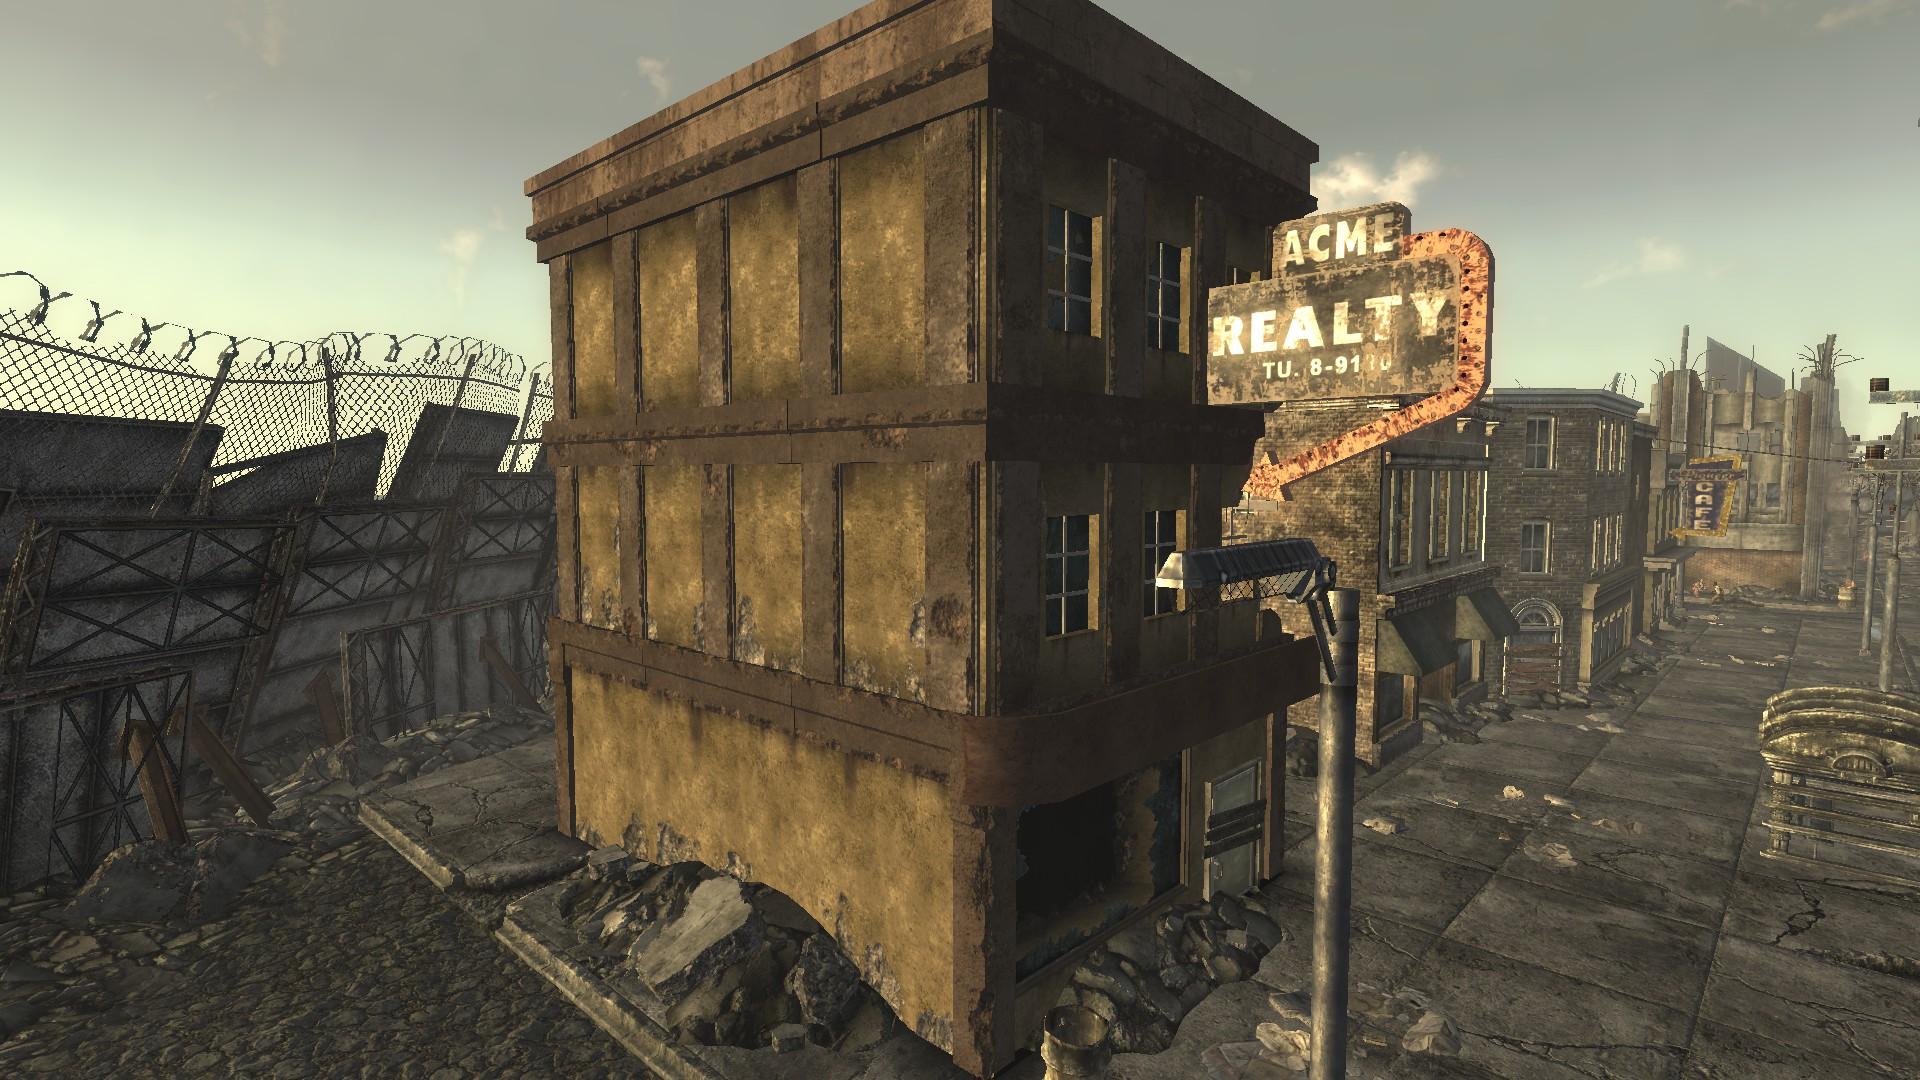 ACME Realty | Fallout Wiki | FANDOM powered by Wikia